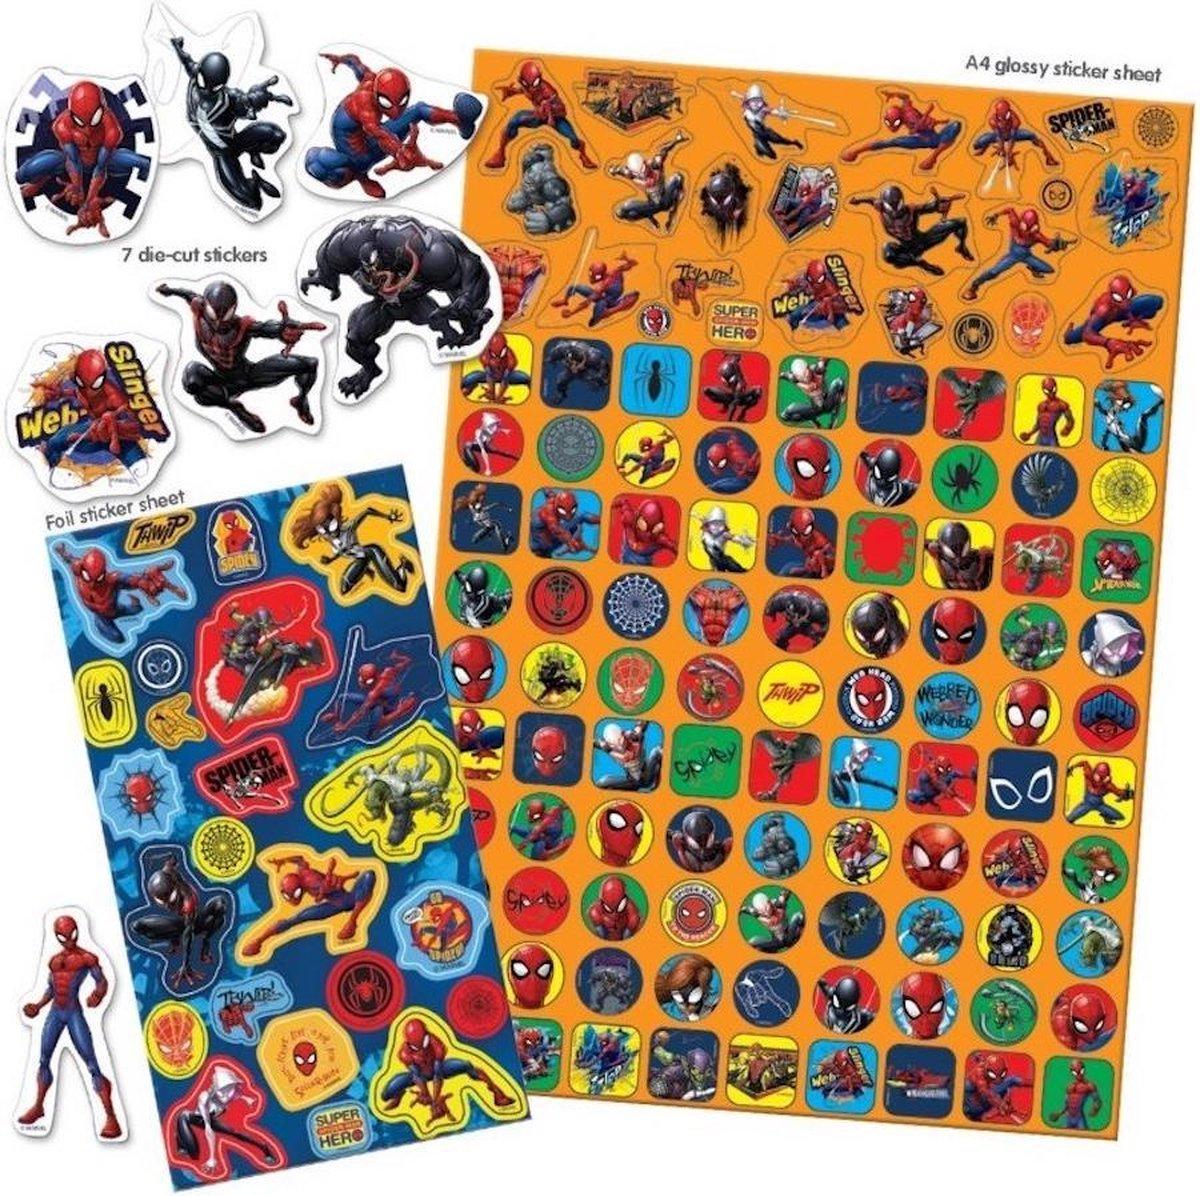 Spiderman mega sticker set